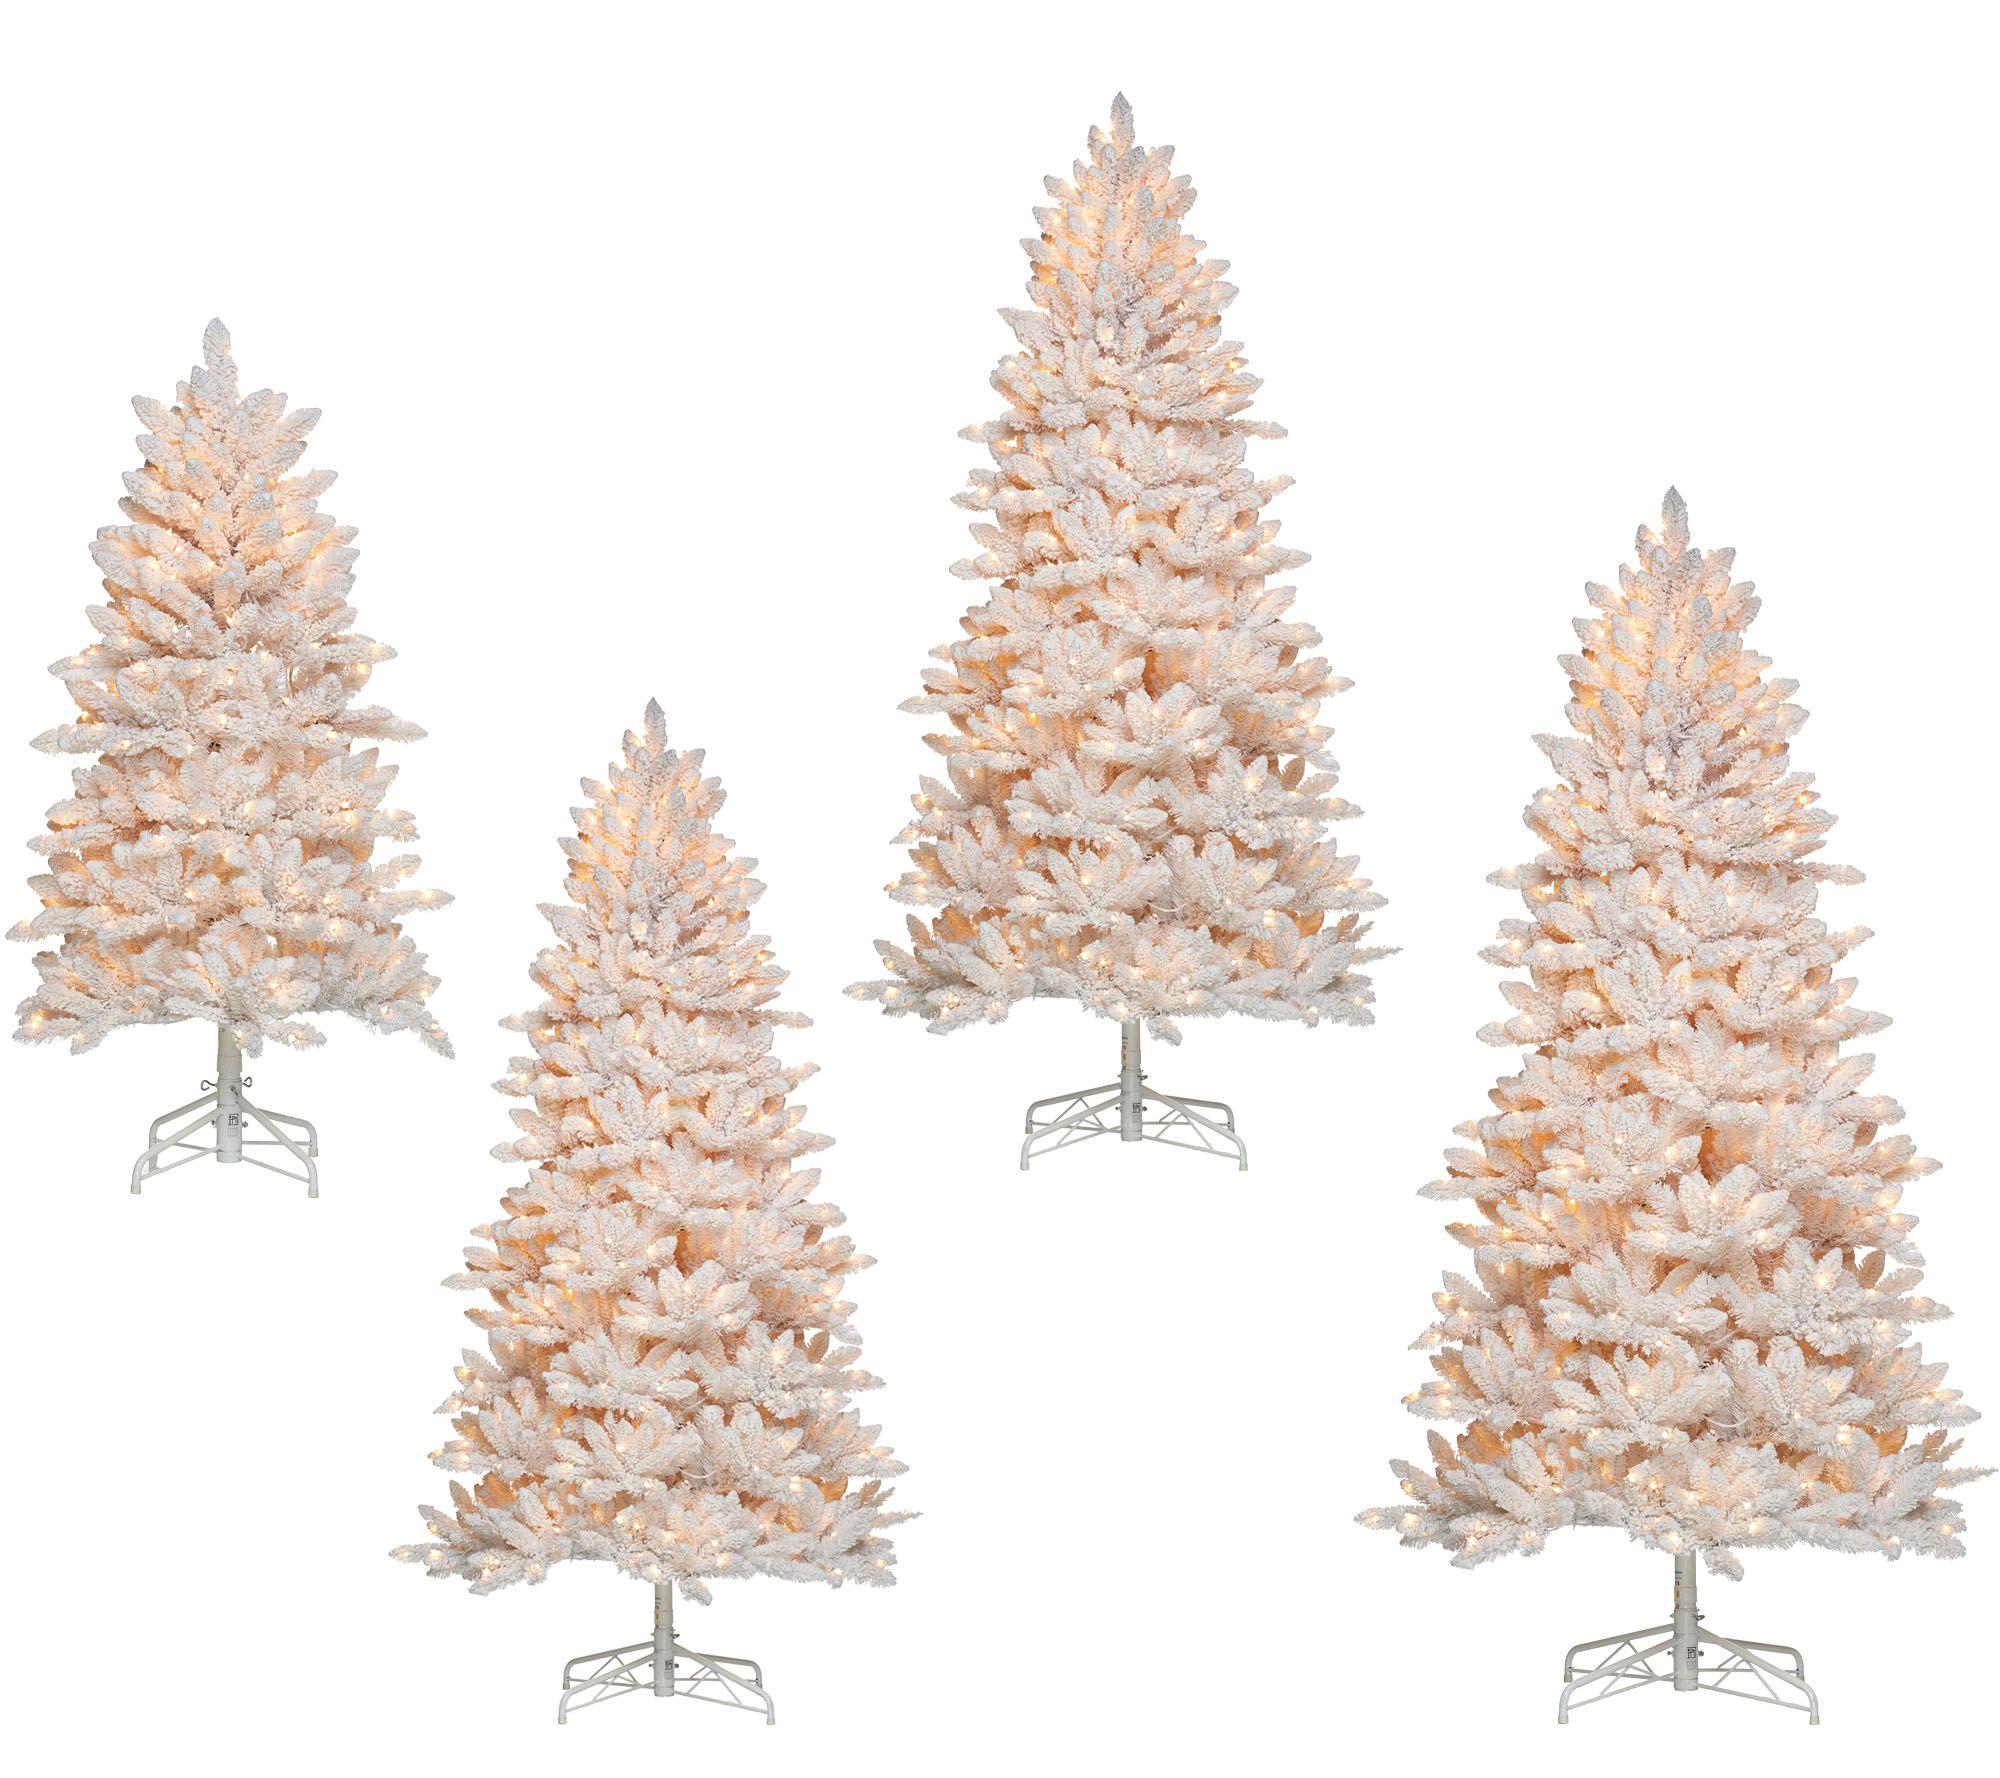 Bethlehem Lights Flocked Christmas Tree with Instant Power — QVC.com